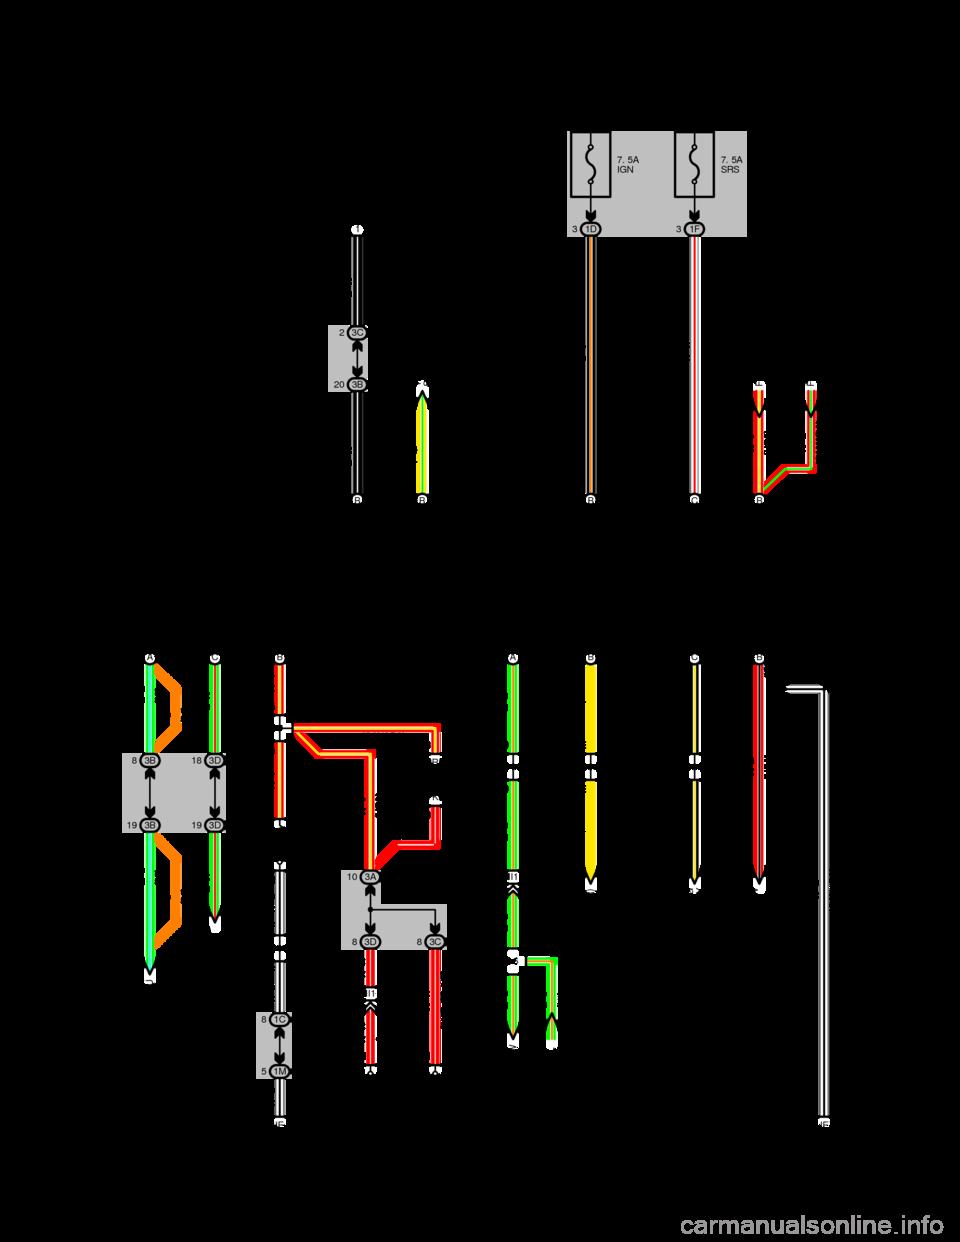 Brake Fluid Toyota Camry 1994 Xv10 4g Wiring Diagrams Workshop Manual Warning Indicator Light Diagram G Page 237